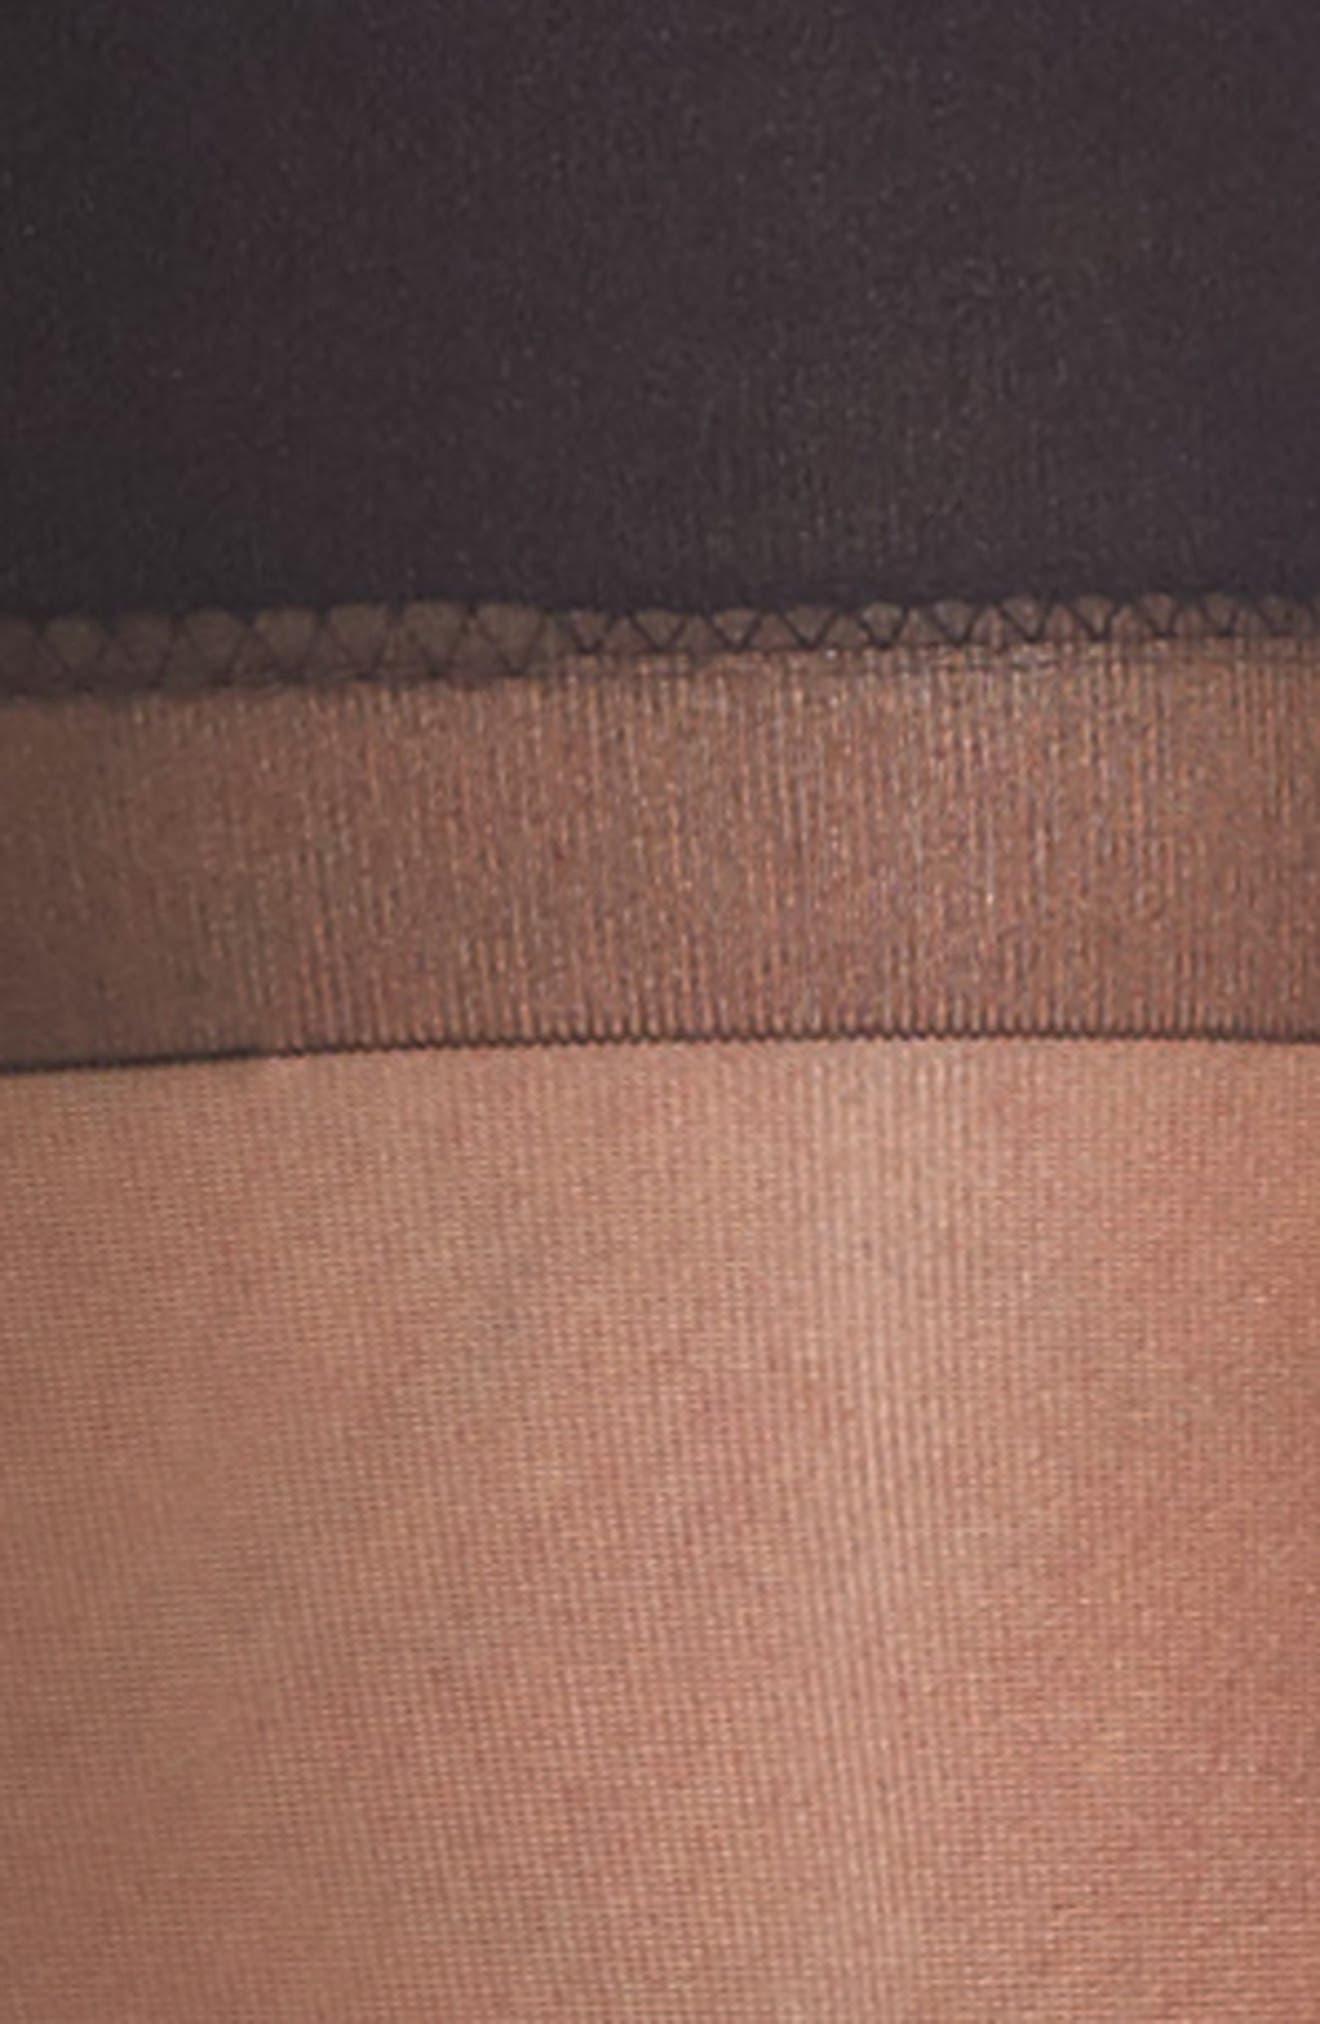 Alternate Image 3  - Oroblu Evita Stockings & Garter Belt